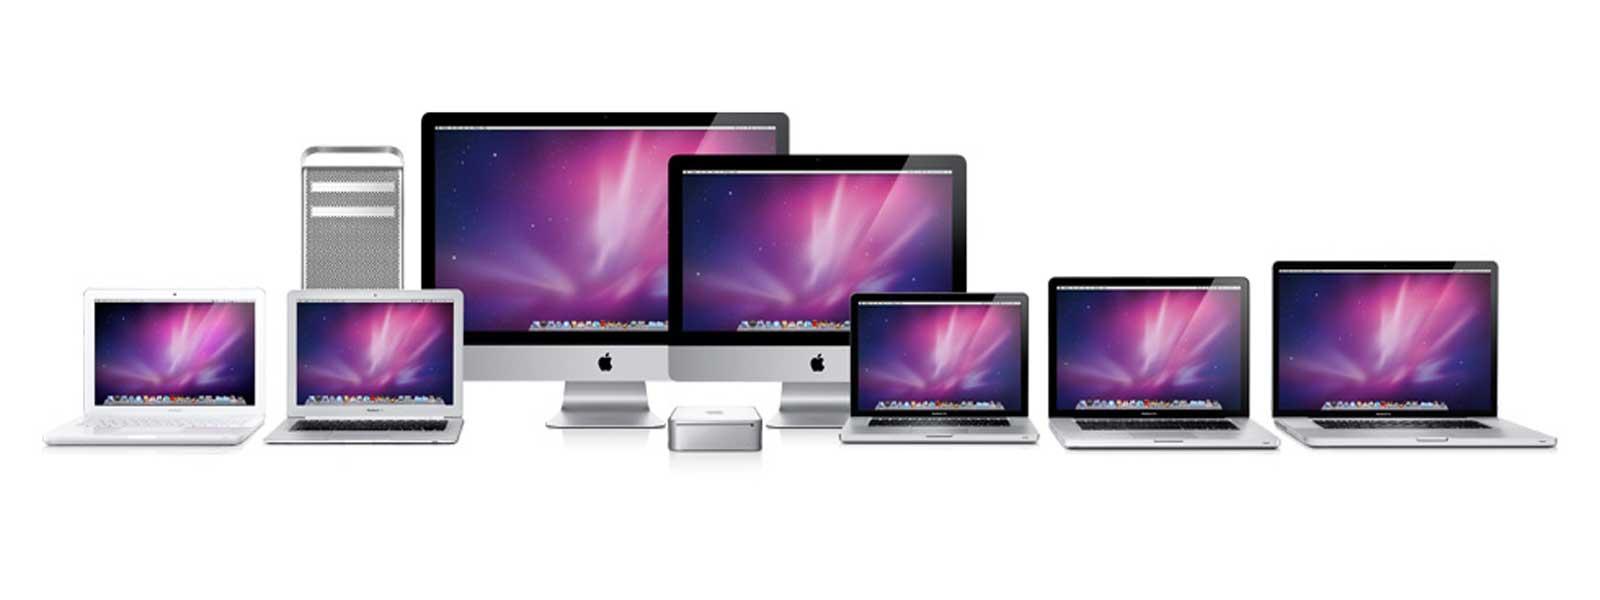 mac_computers.jpg